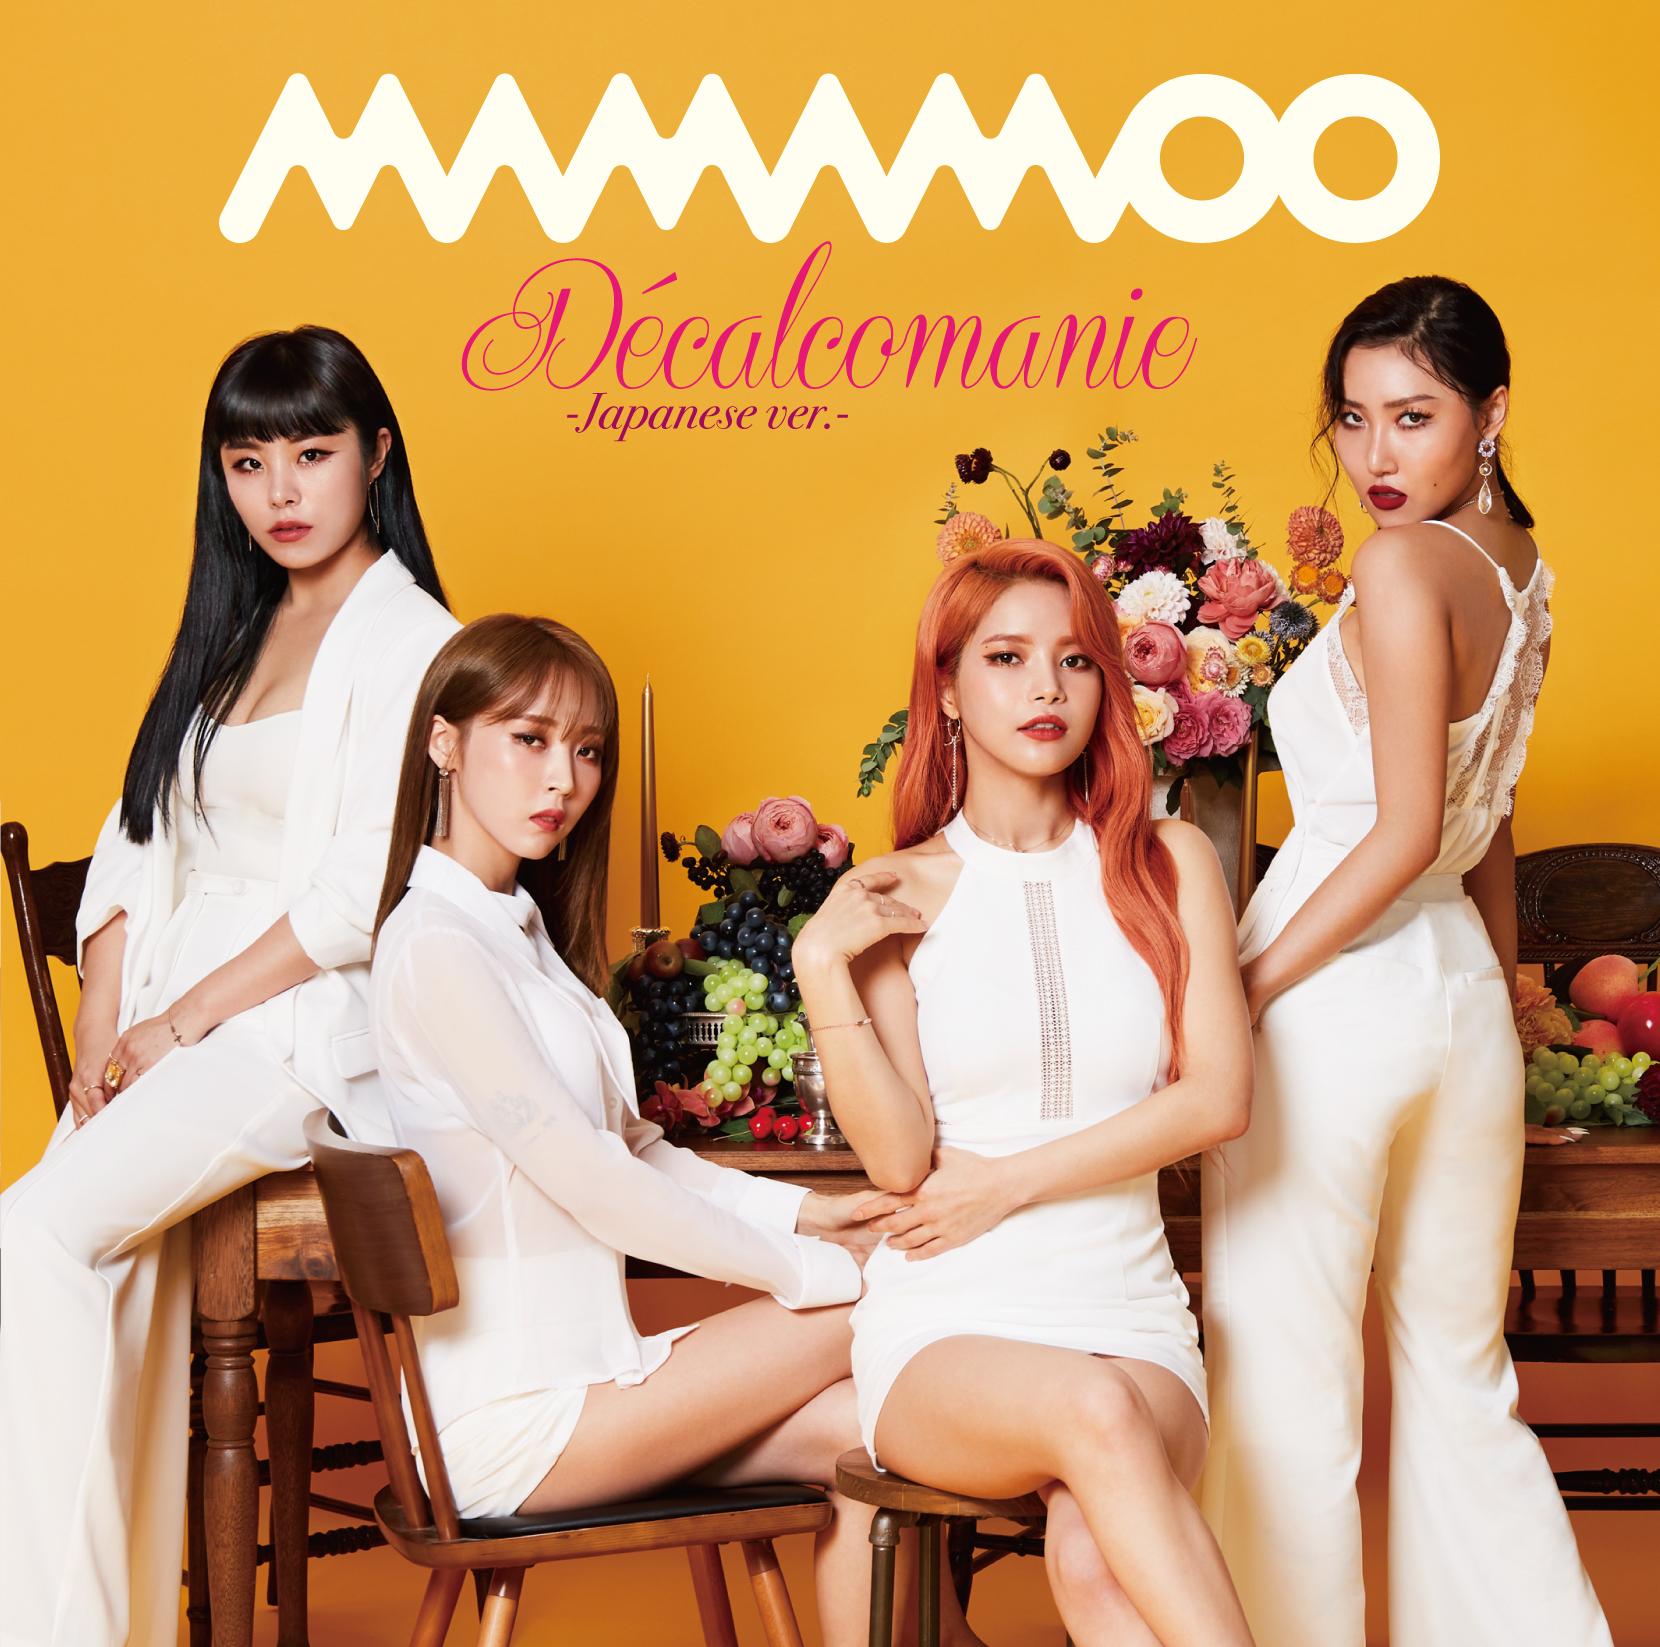 [MAMAMOO] Decalcomanie -Japanese ver.B